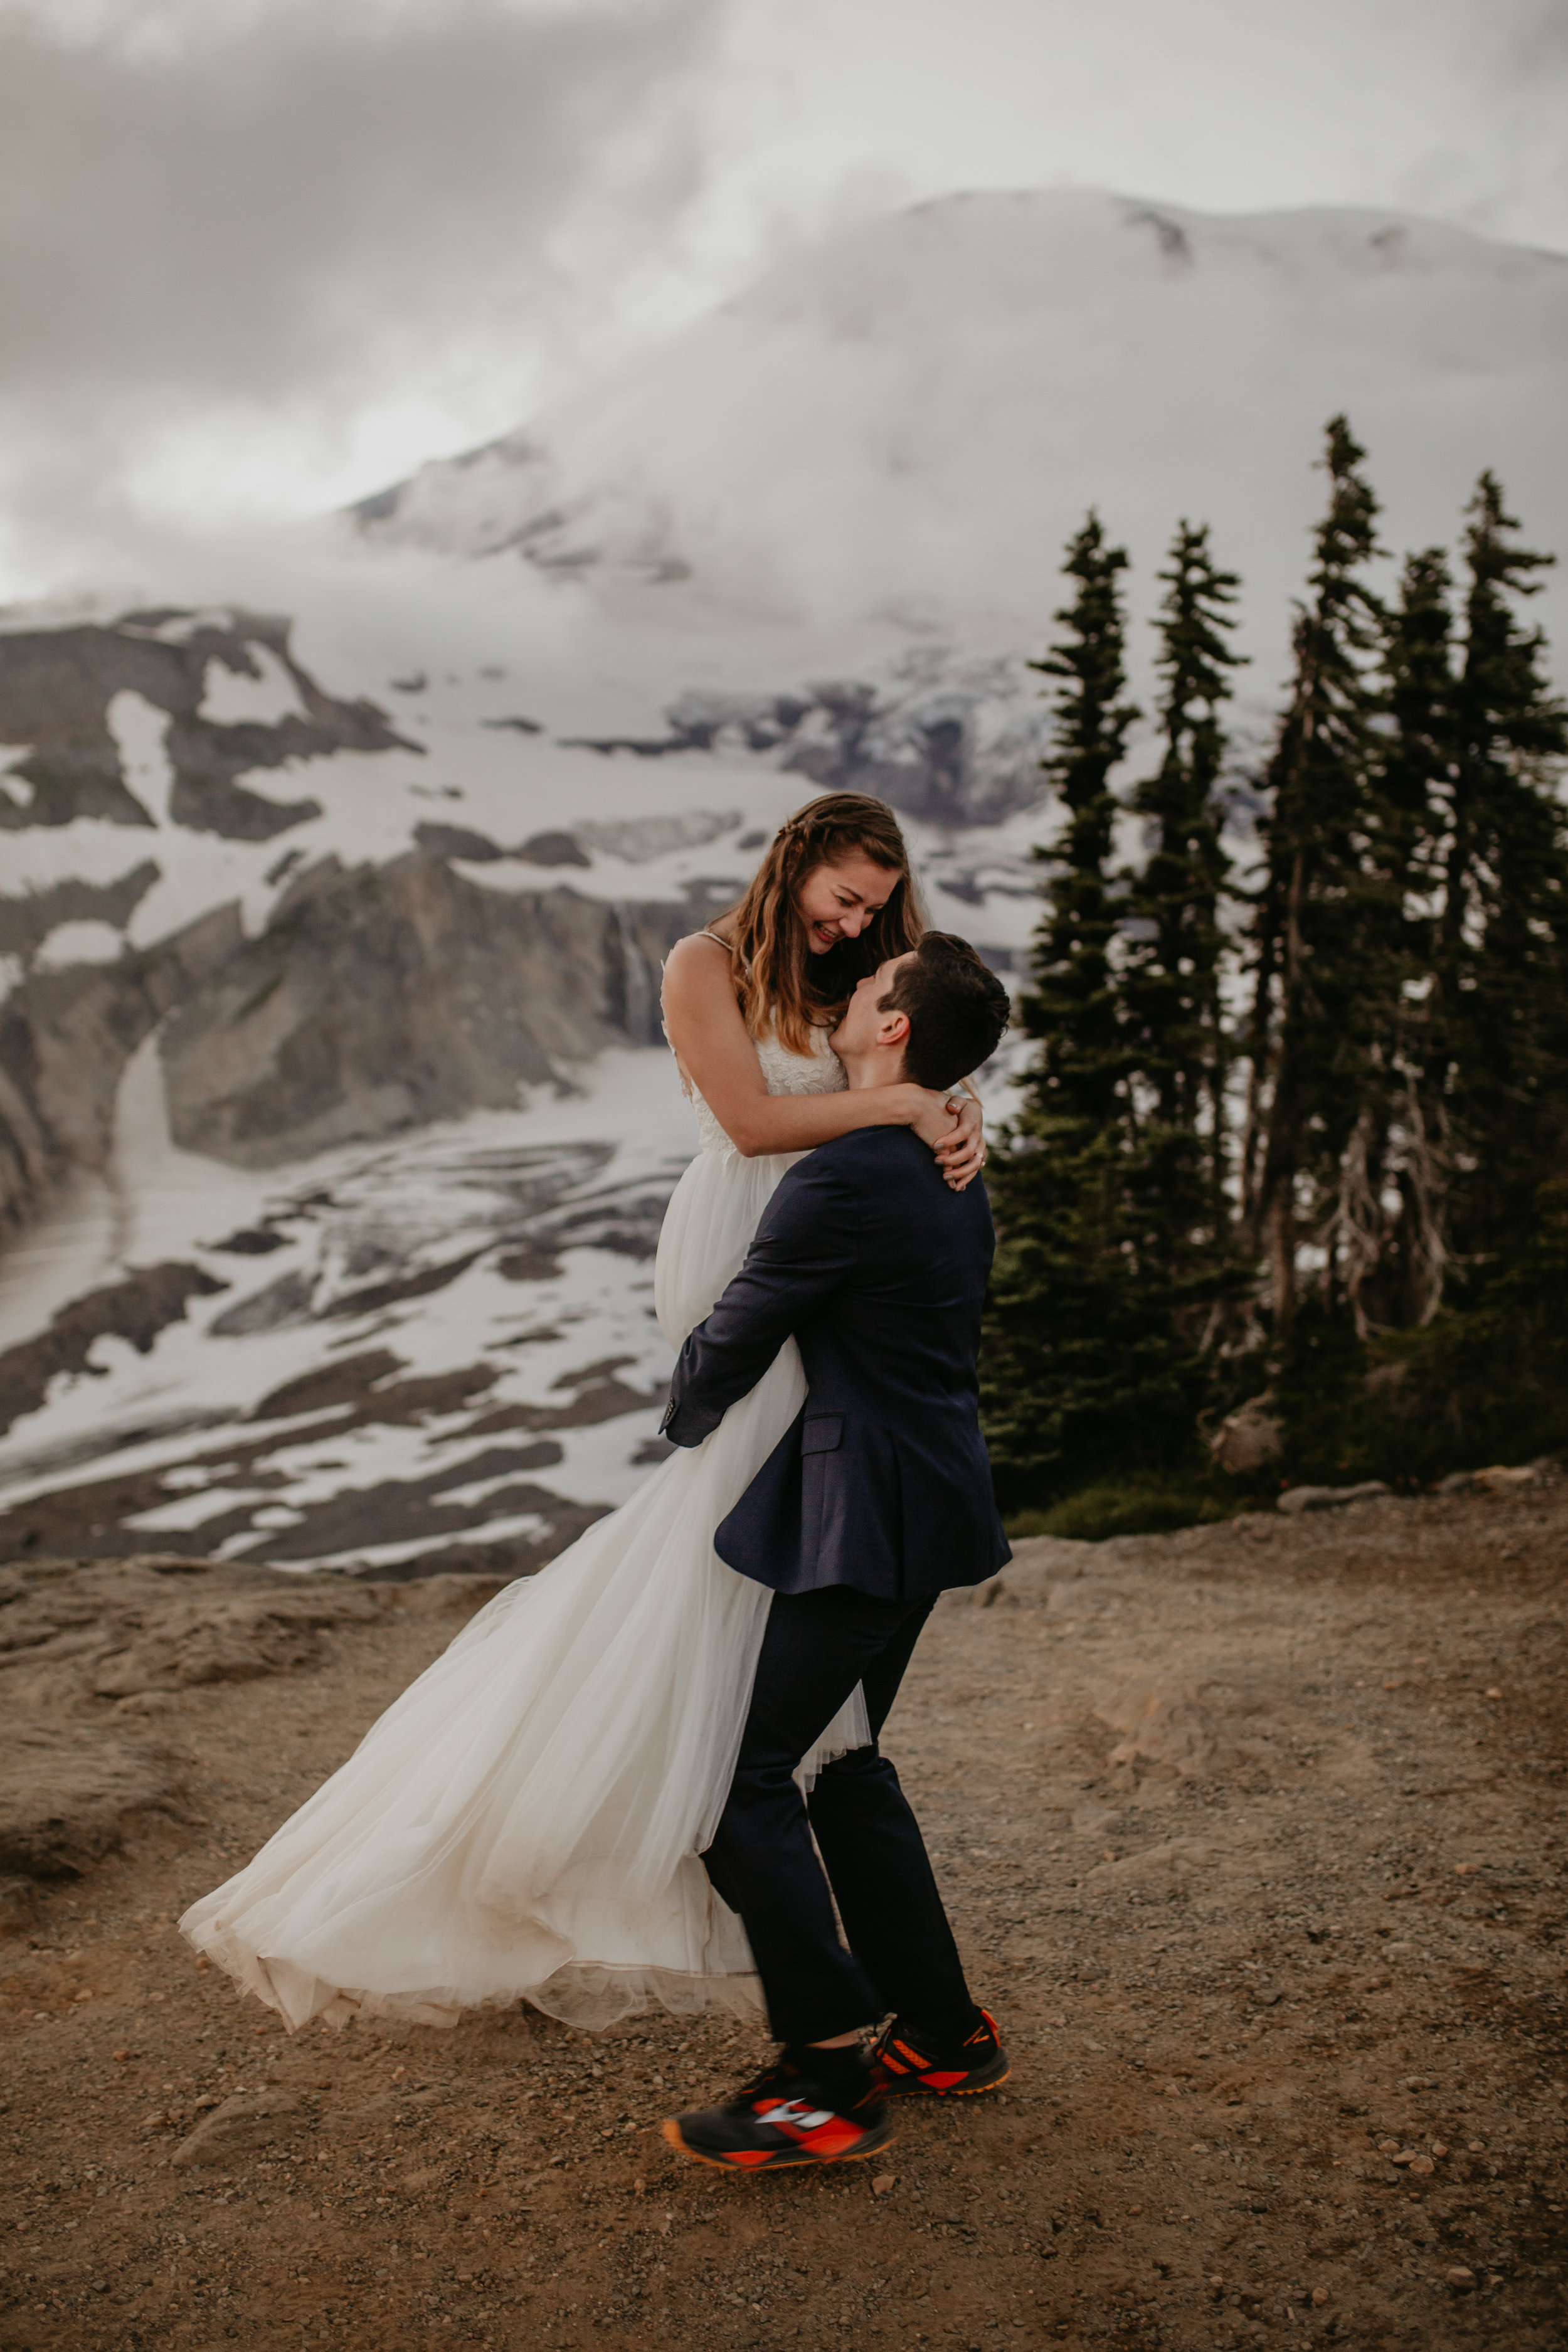 Nicole-Daacke-Photography-Mt-Rainier-elopement-photographer-washington-mountain-epic-wedding-photography-wildflowers-at-rainier-pine-tree-cloudy-summer-day-at-mountain-rainier-68.jpg